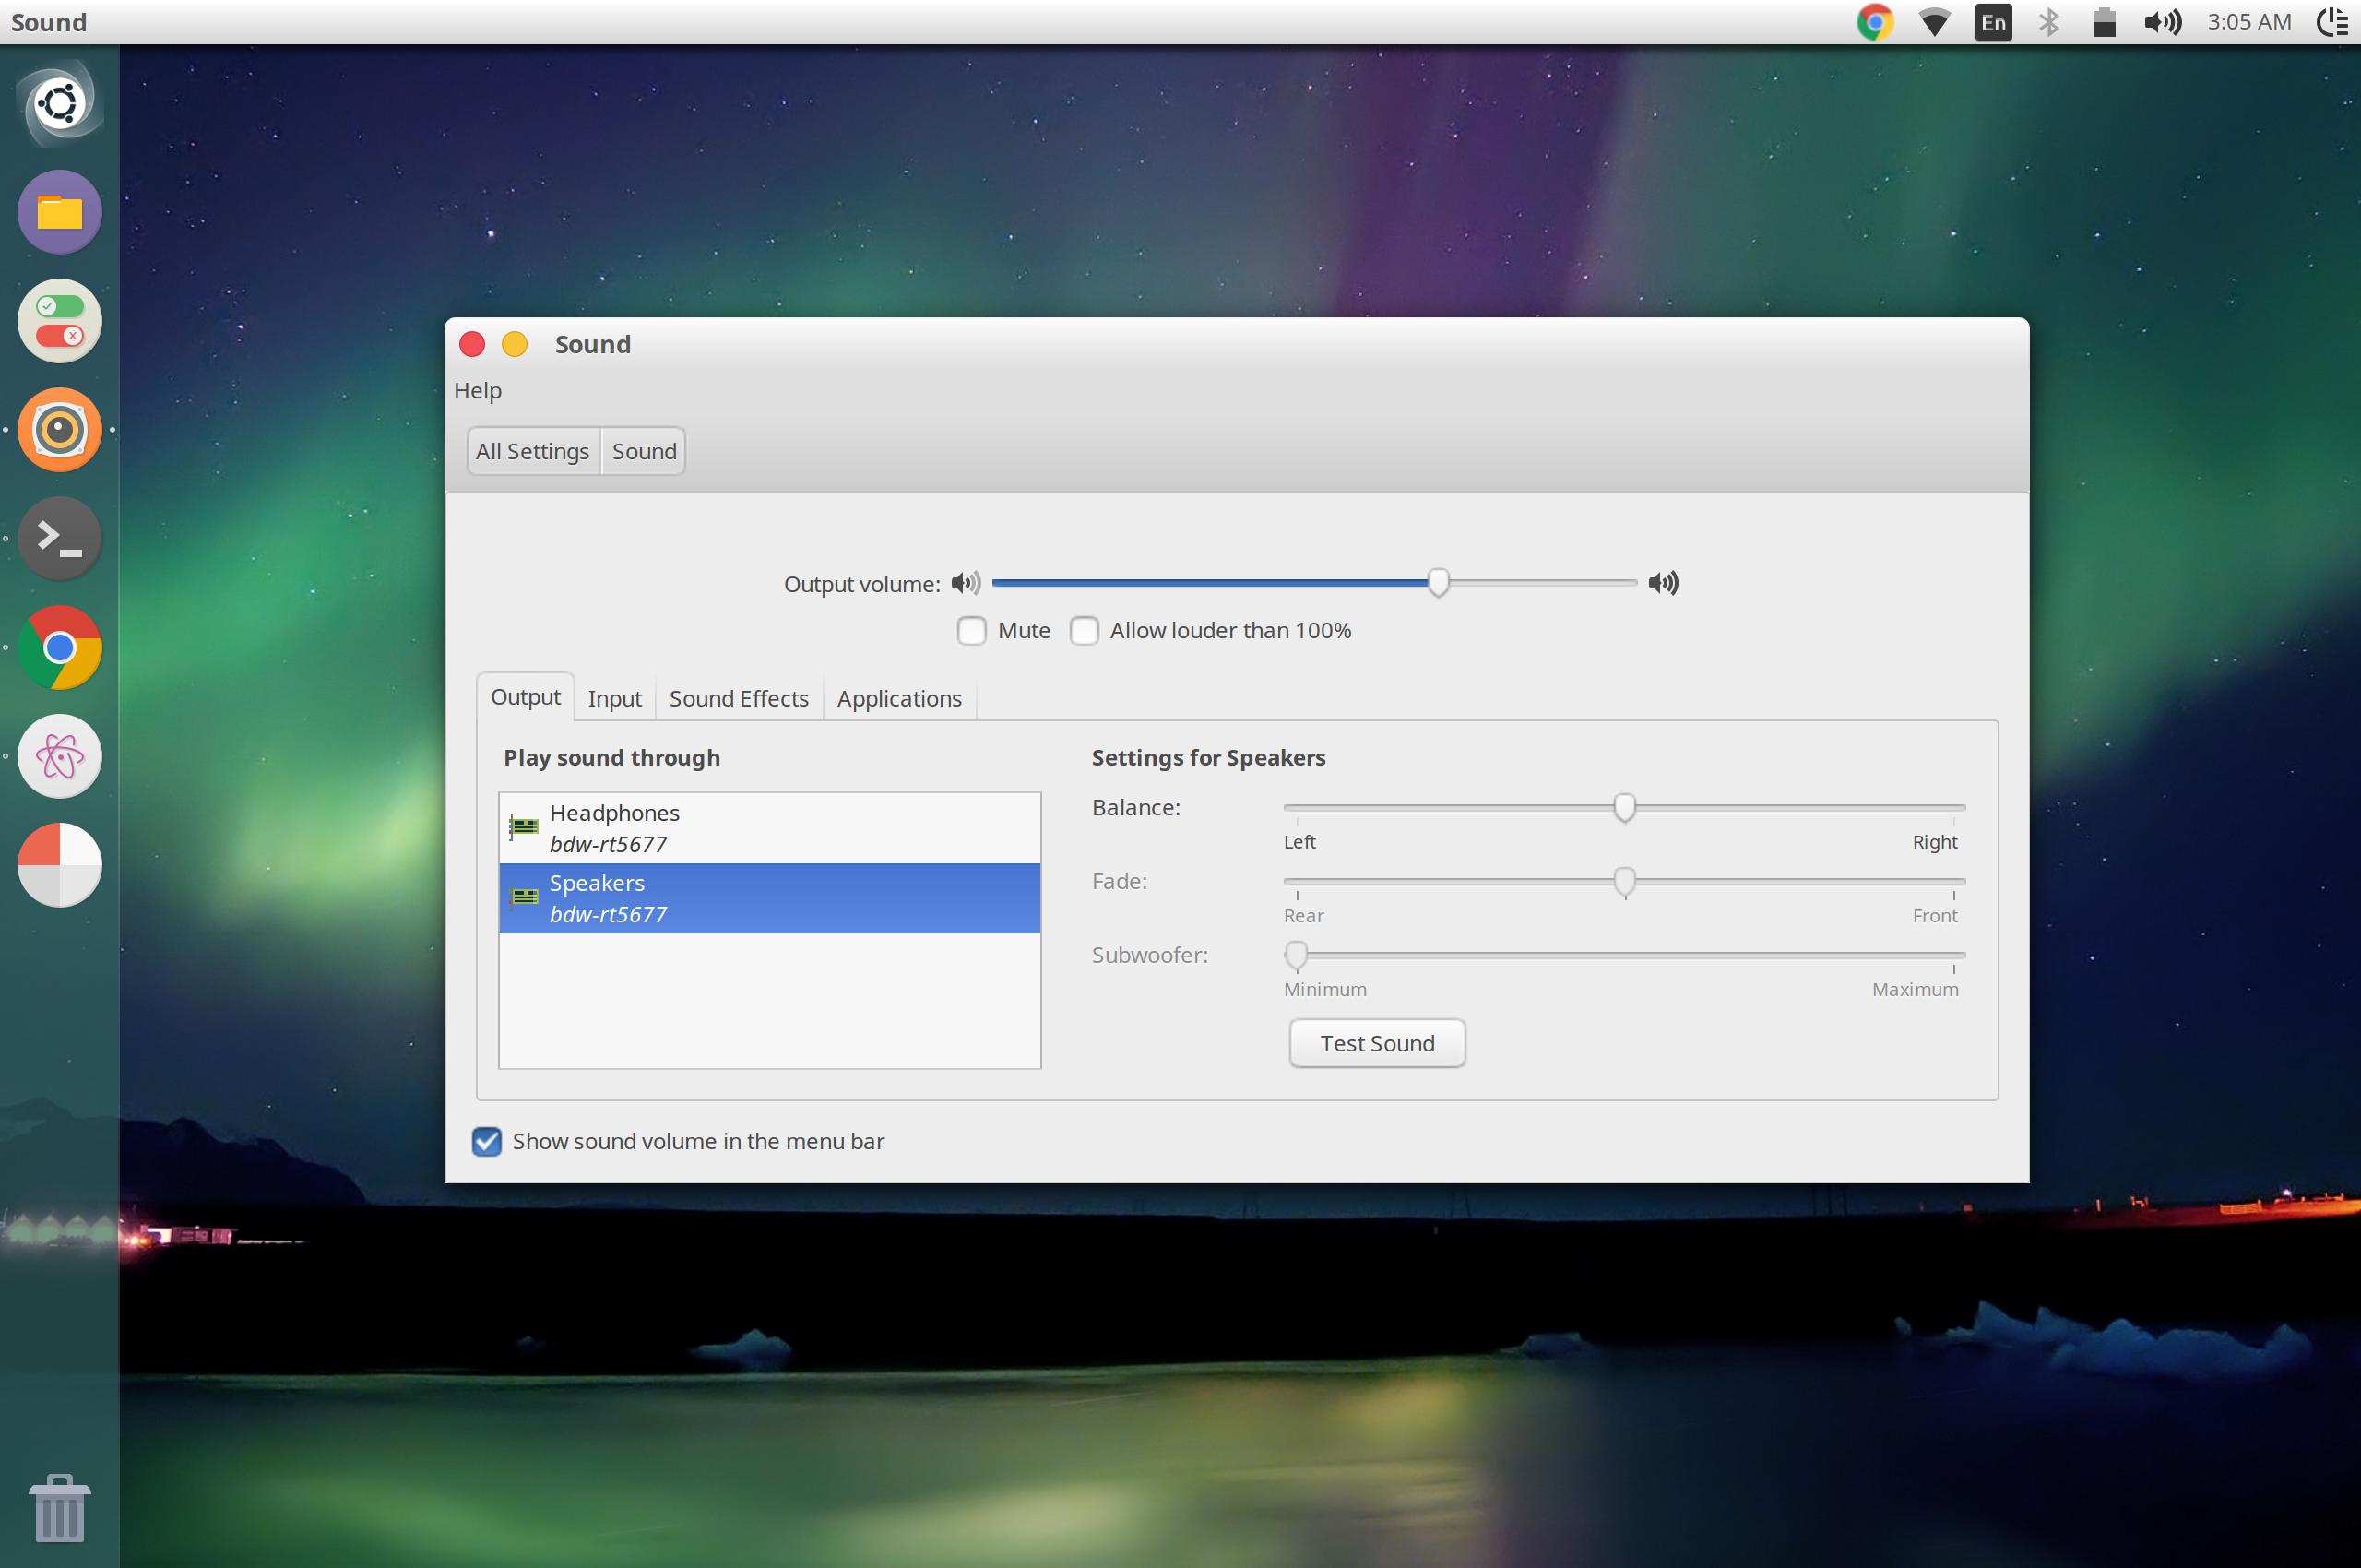 Ubuntu Sound settings showing bdw-rt5677 devices